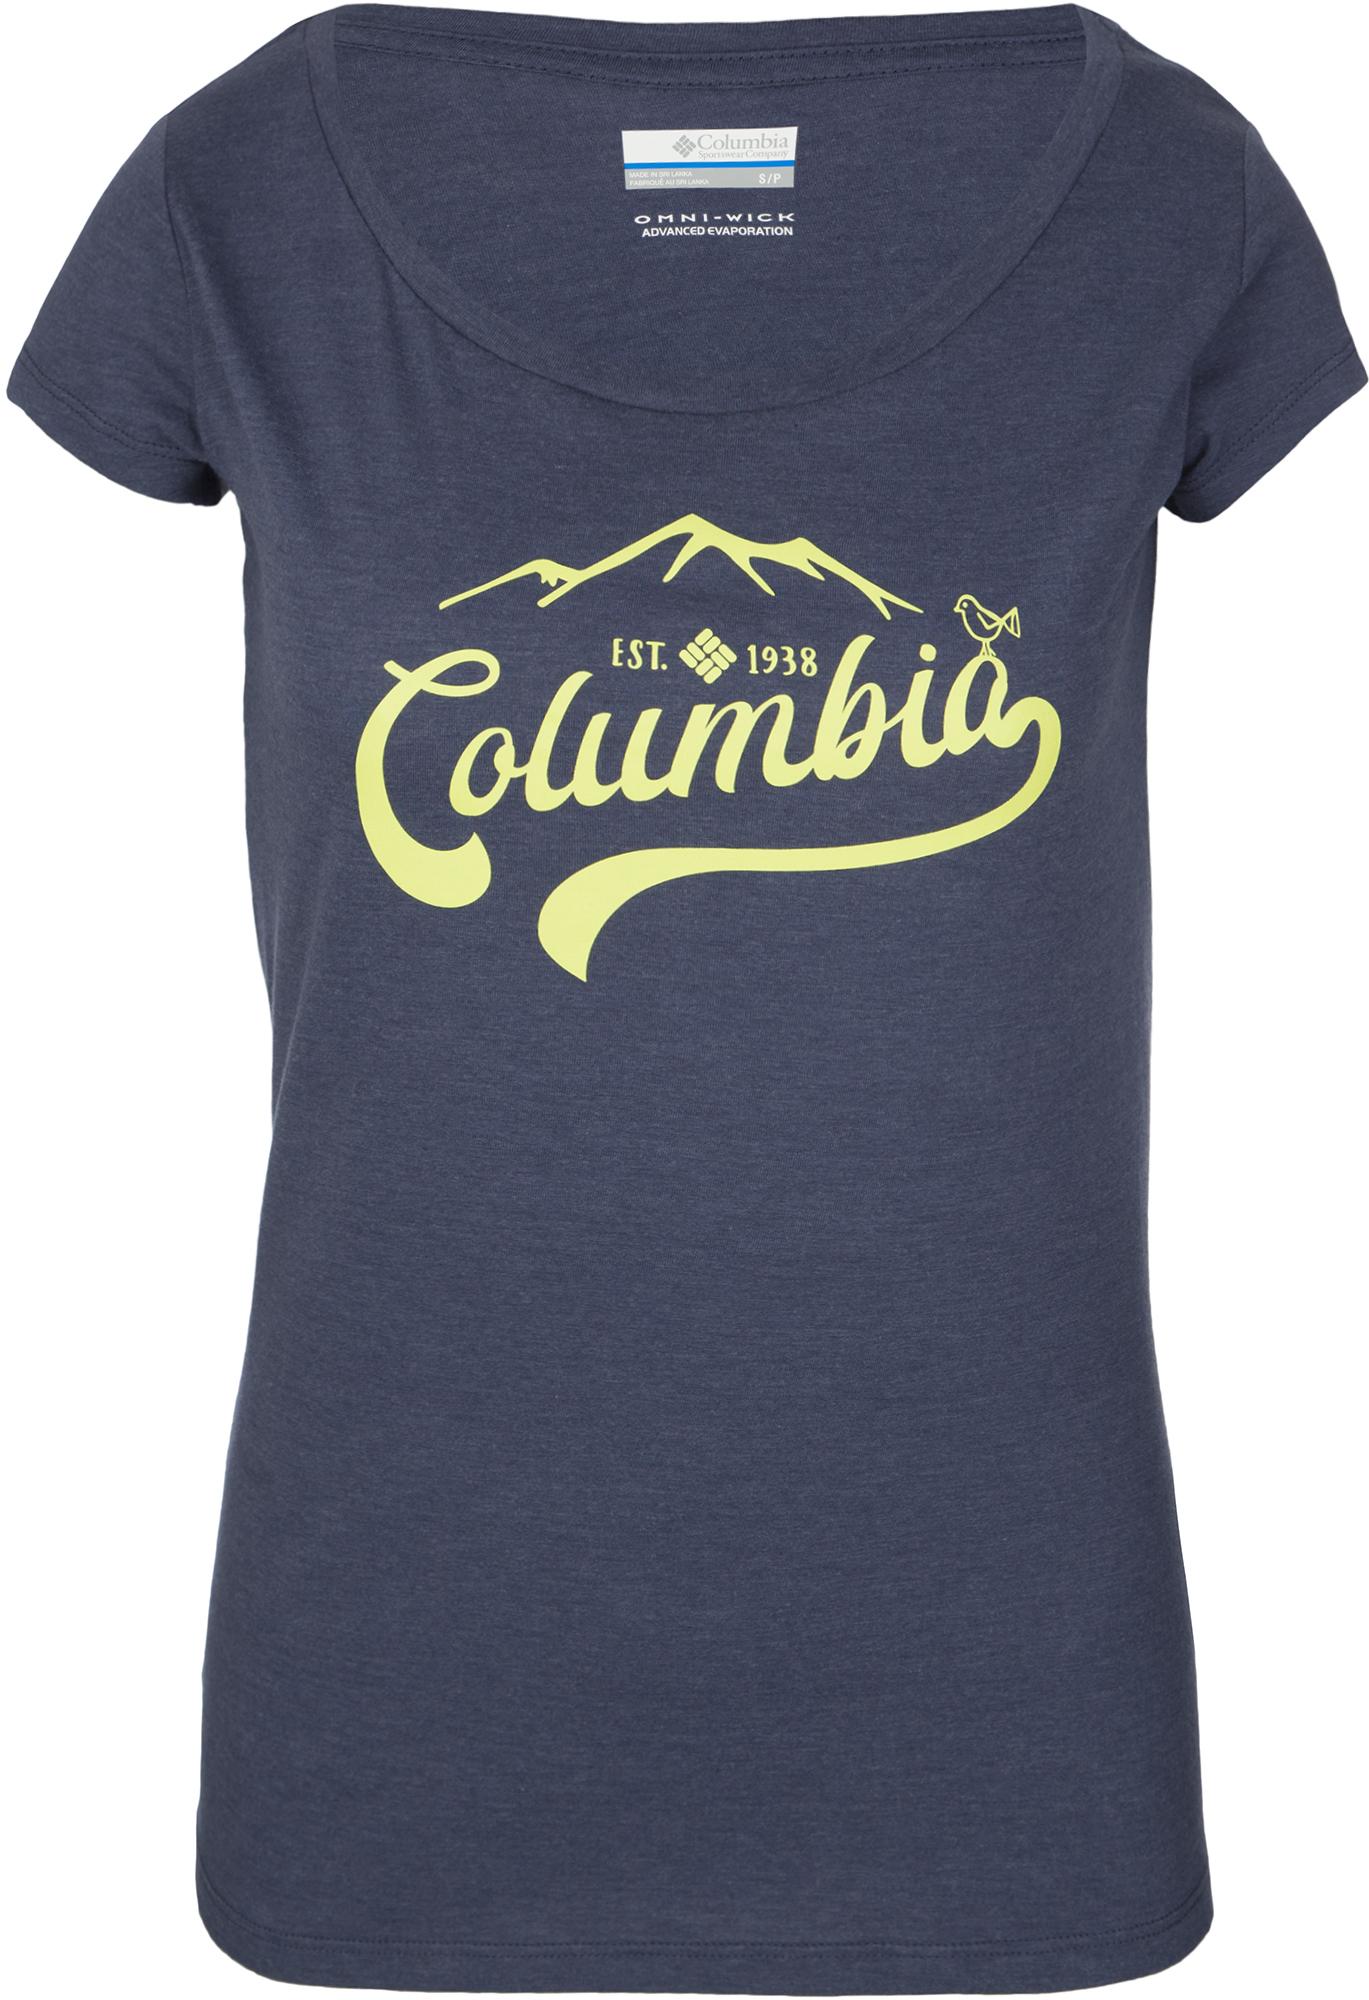 Columbia Футболка женская Columbia Outdoor Play Tee, размер 50 недорго, оригинальная цена